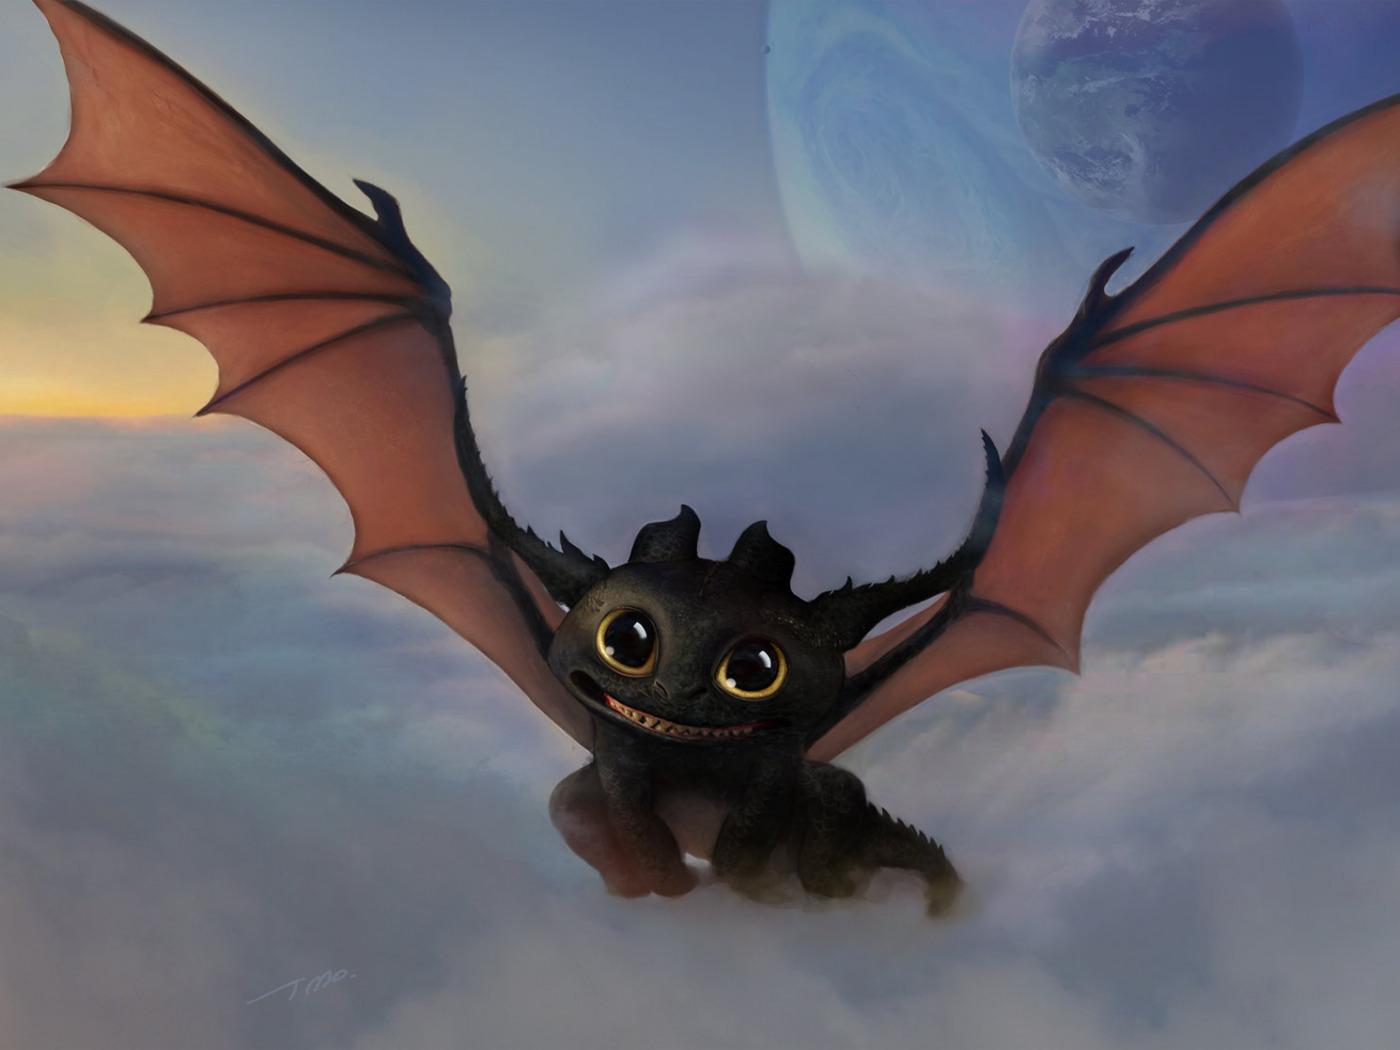 картинки кпд драконы беззубик бесплатно крутые картинки